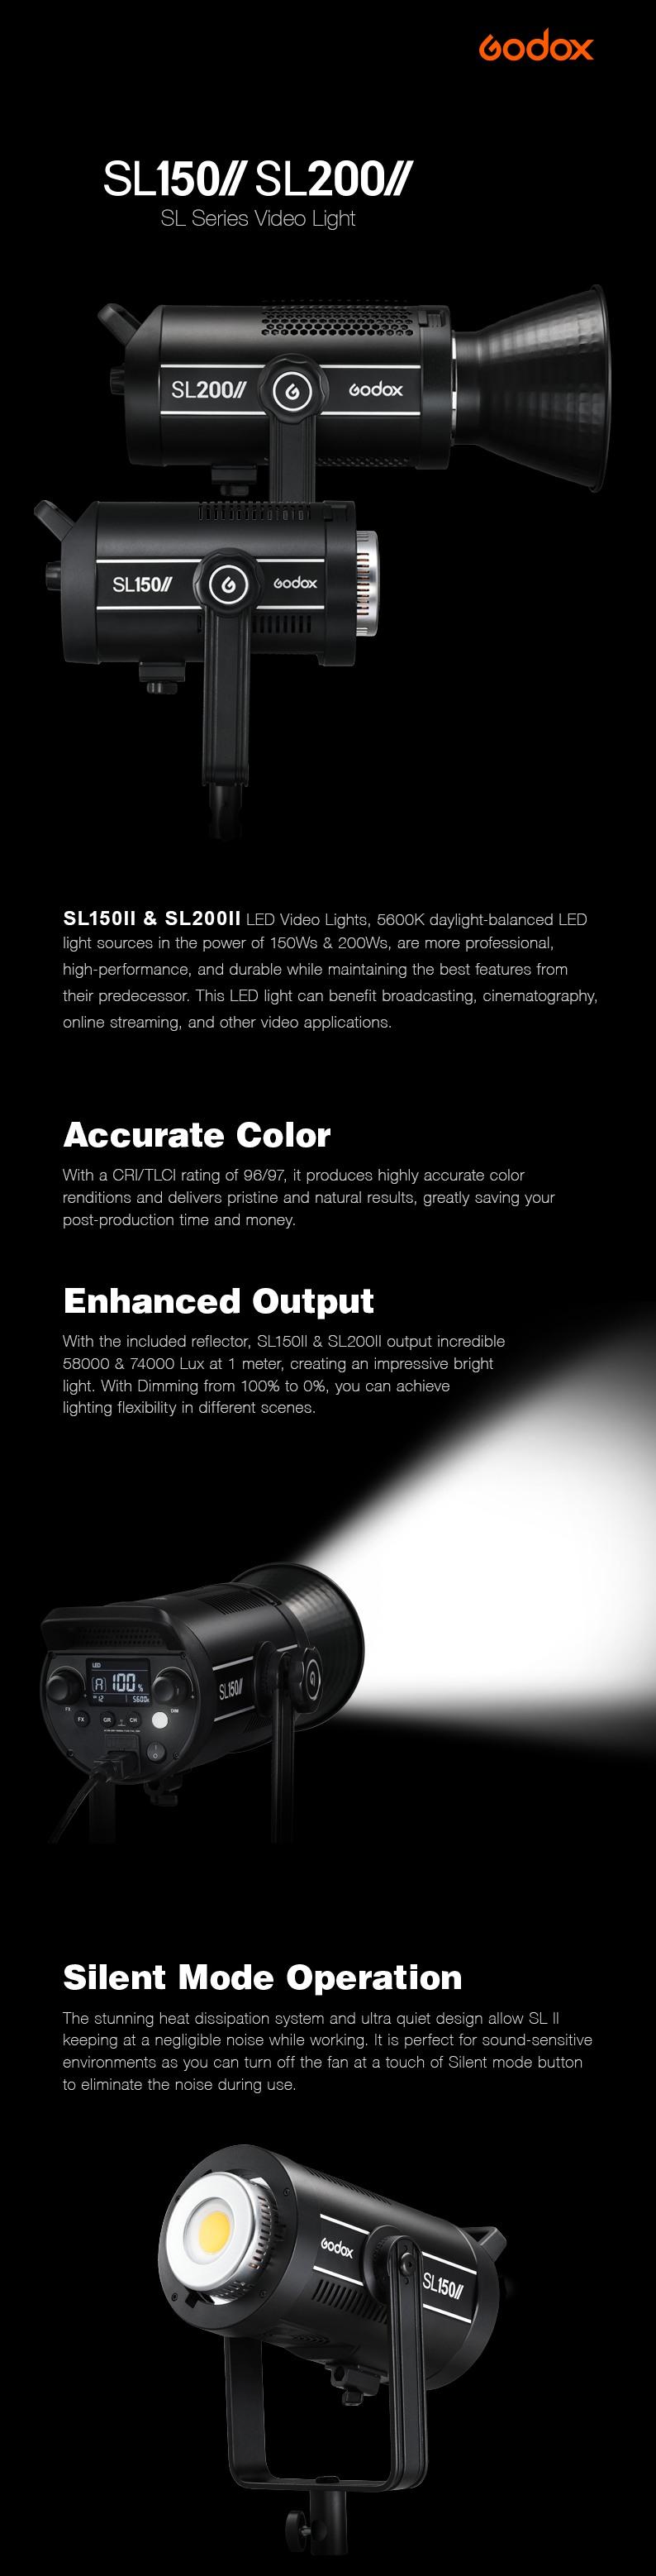 Godox SL150II \ SL200II LED lights. Accurate Color, Enhanced output. Silient Mode Operation.